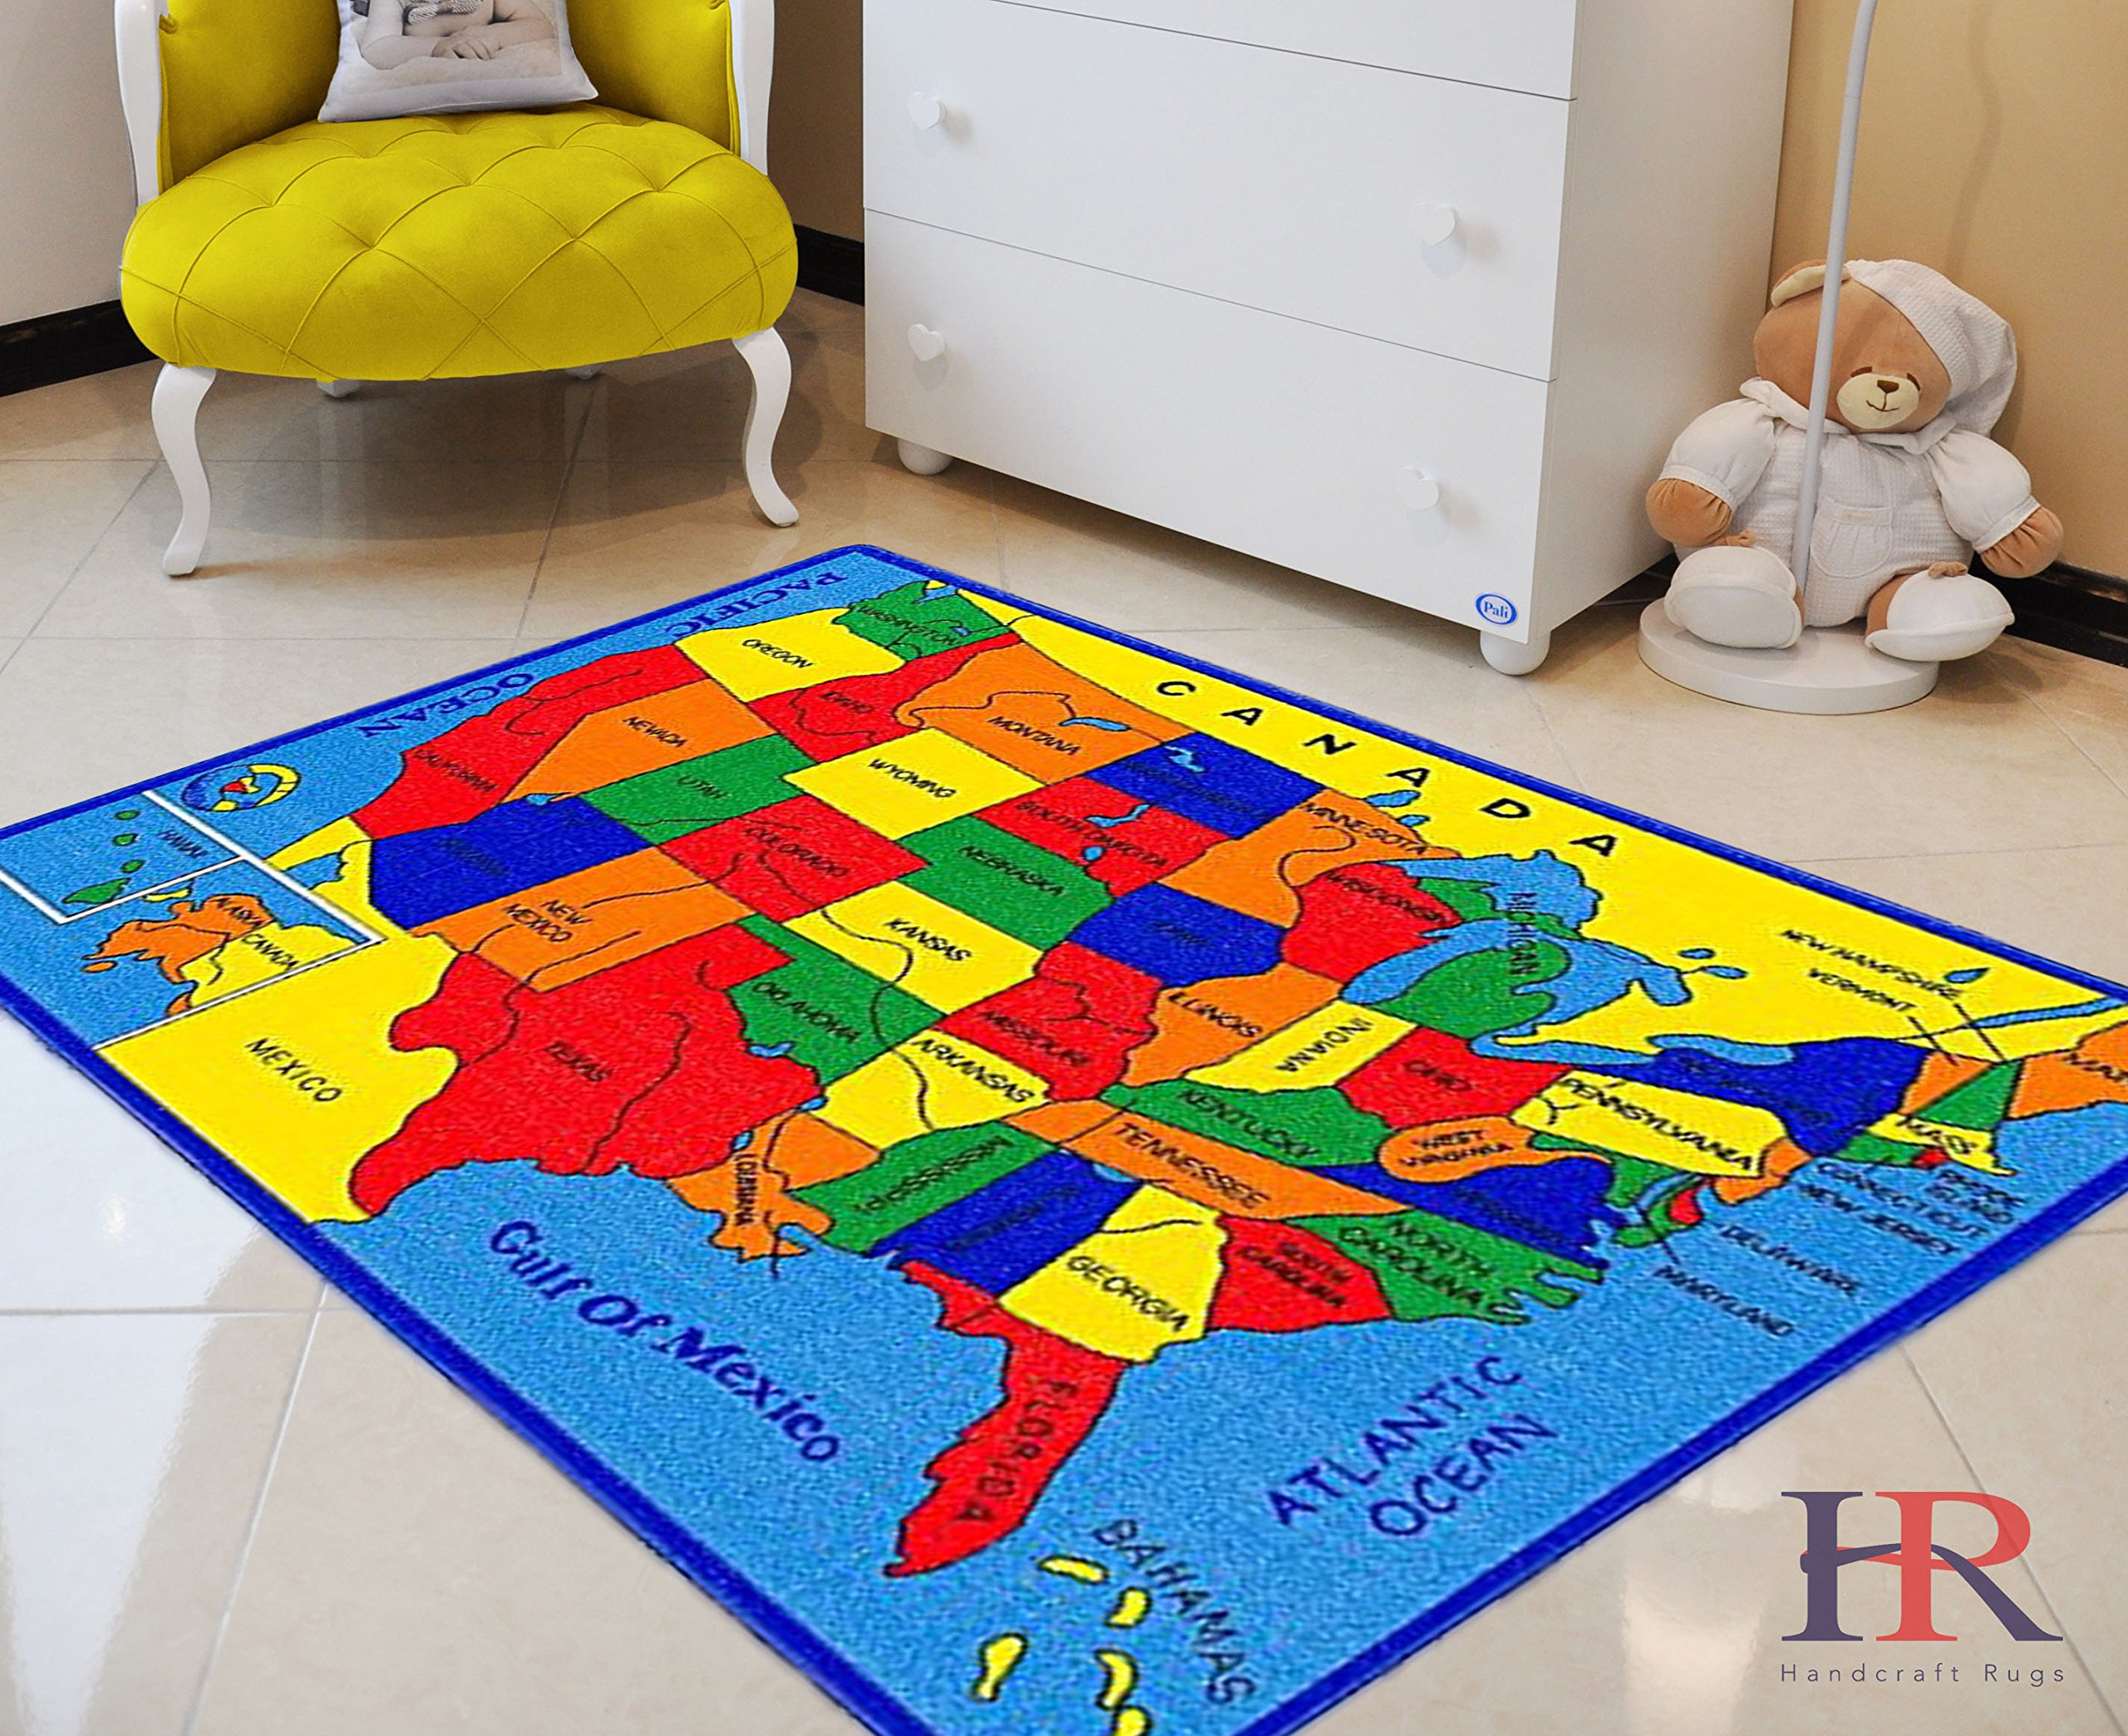 USA Map Kids Educational Play mat for School/Classroom / Kids Room/Daycare/ Nursery Non-Slip Gel Back Rug Carpet-(3 by 5 feet)